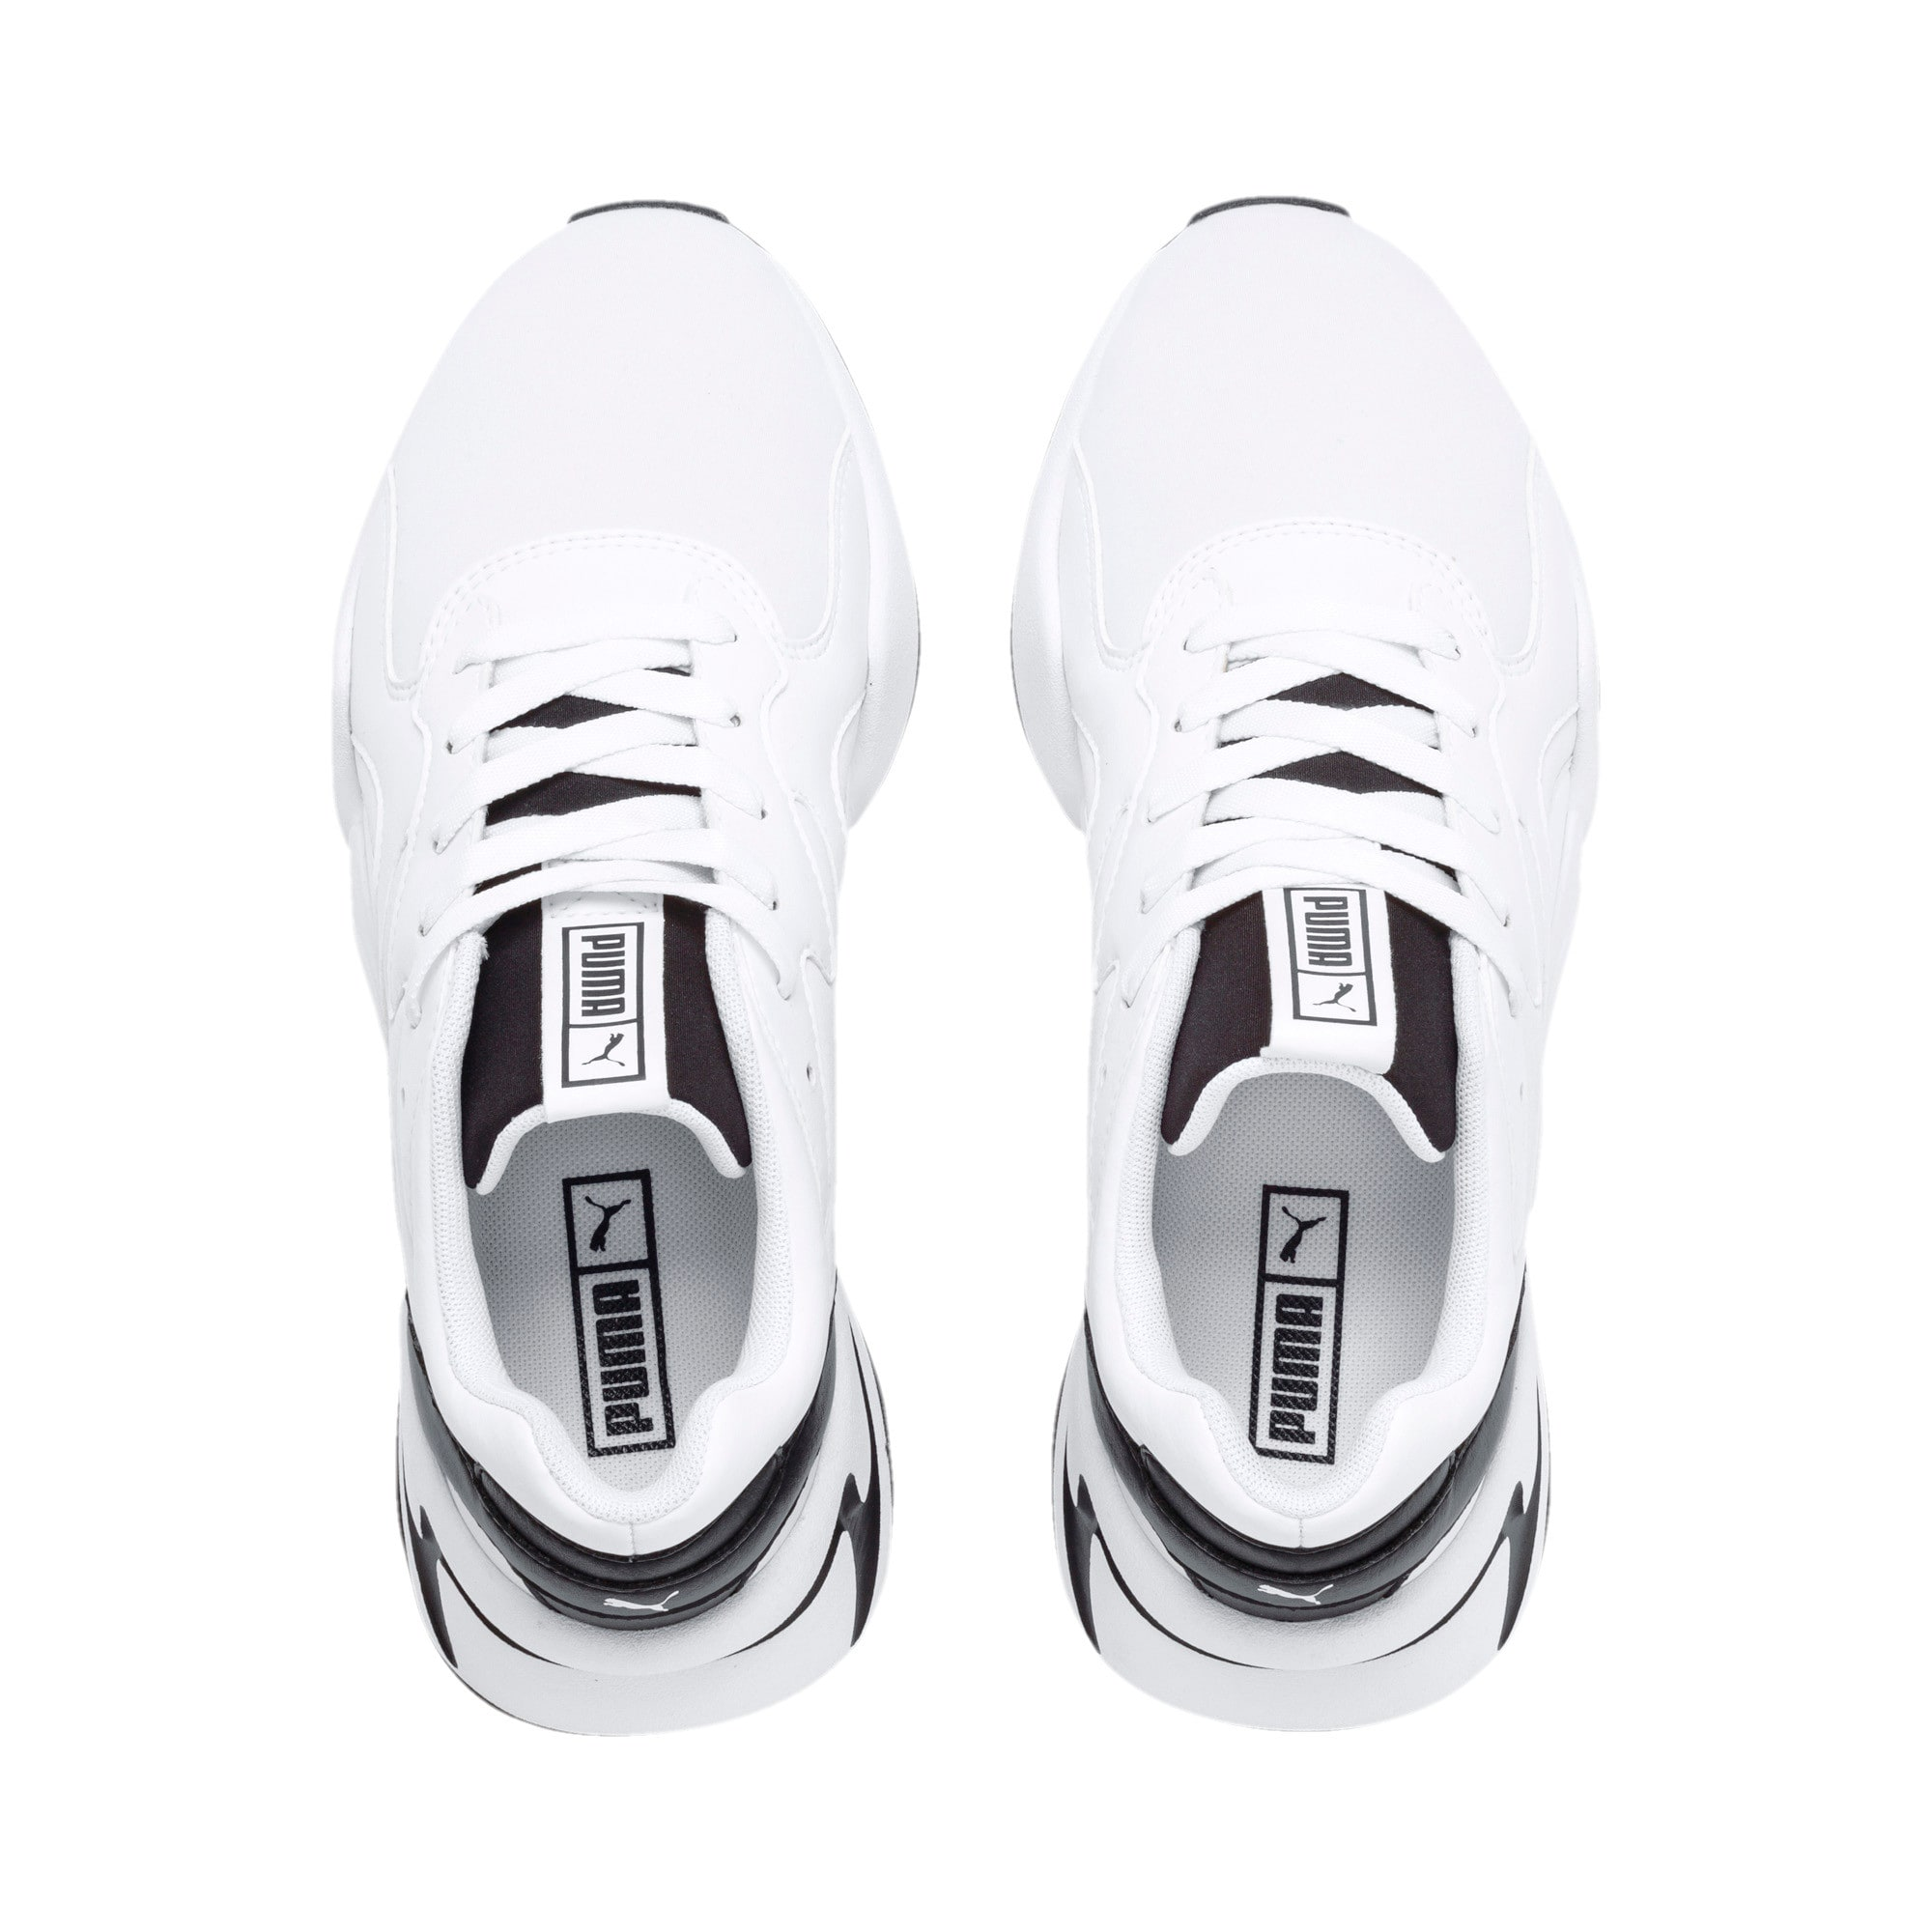 Thumbnail 9 of Nova Women's Sneakers, Puma White-Puma Black, medium